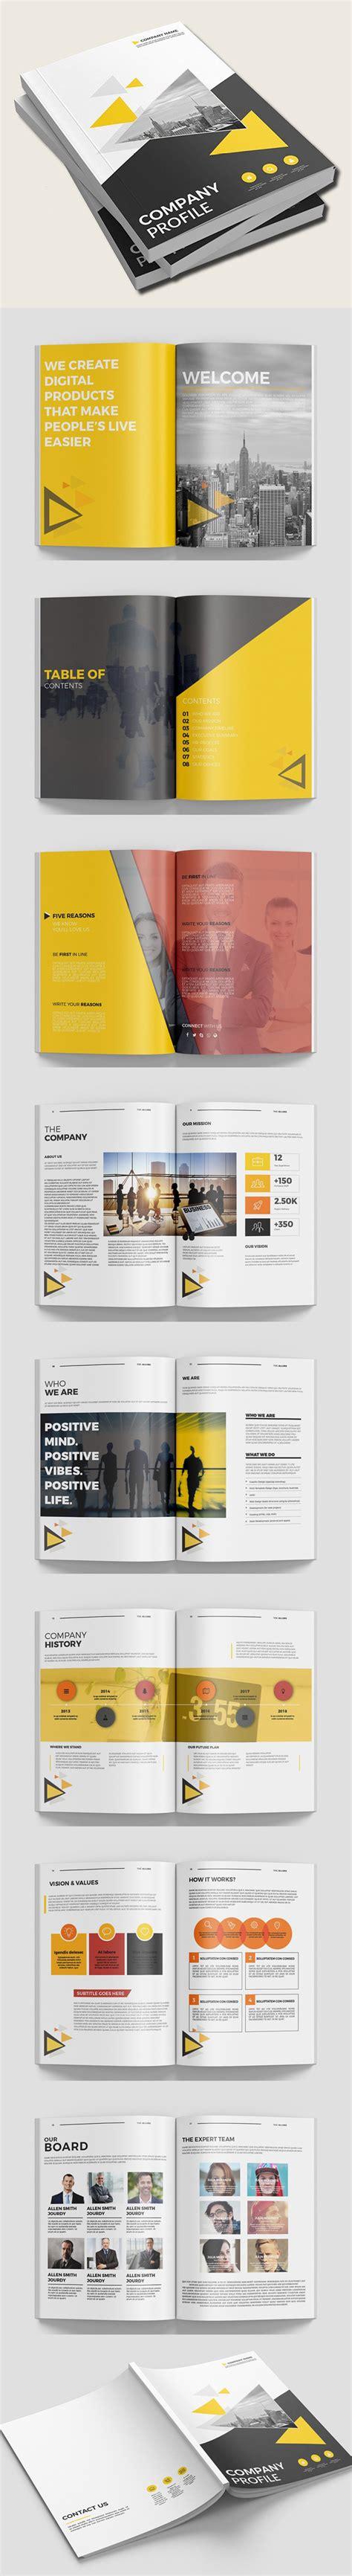 Company Profile Brochure Template Best Business Brochure Templates Design Graphic Design